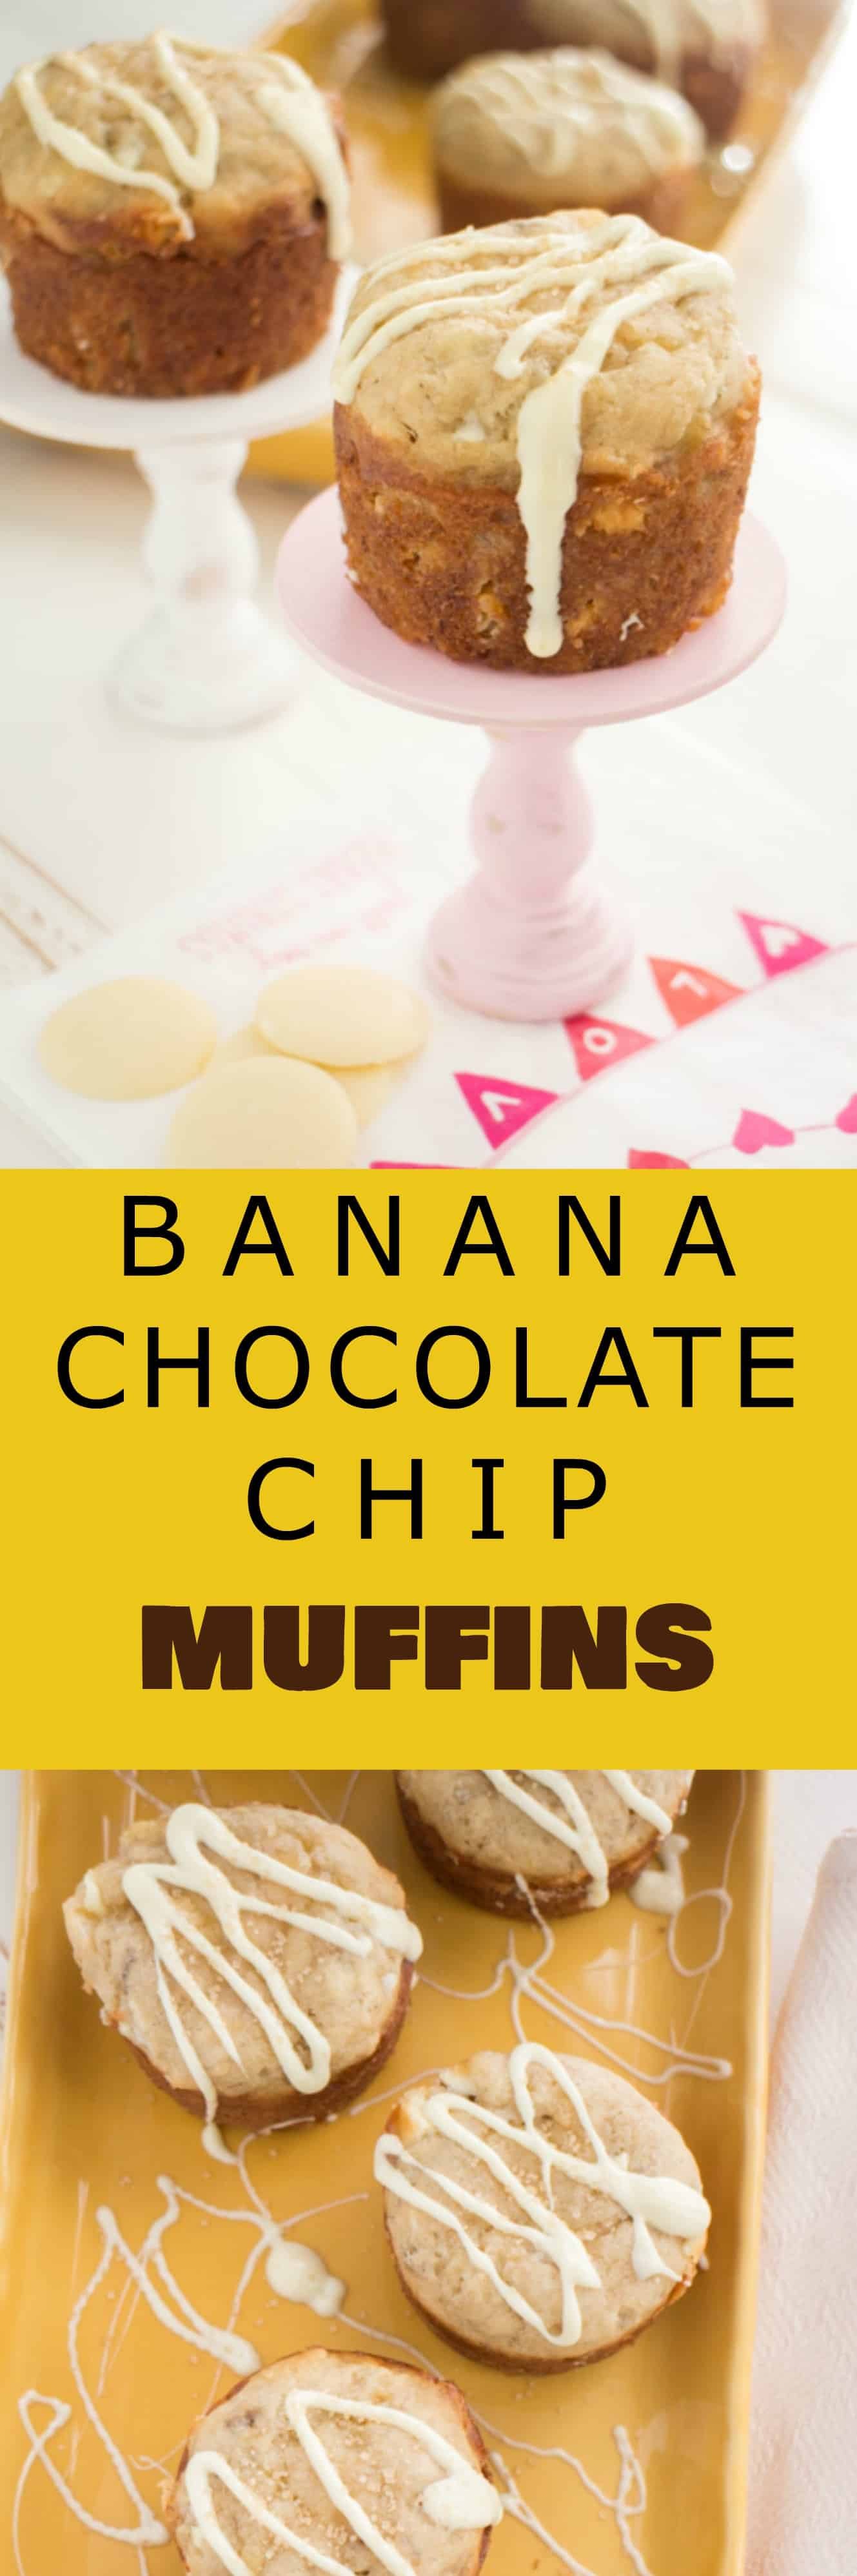 Banana White Chocolate Chip Muffins - Brooklyn Farm Girl